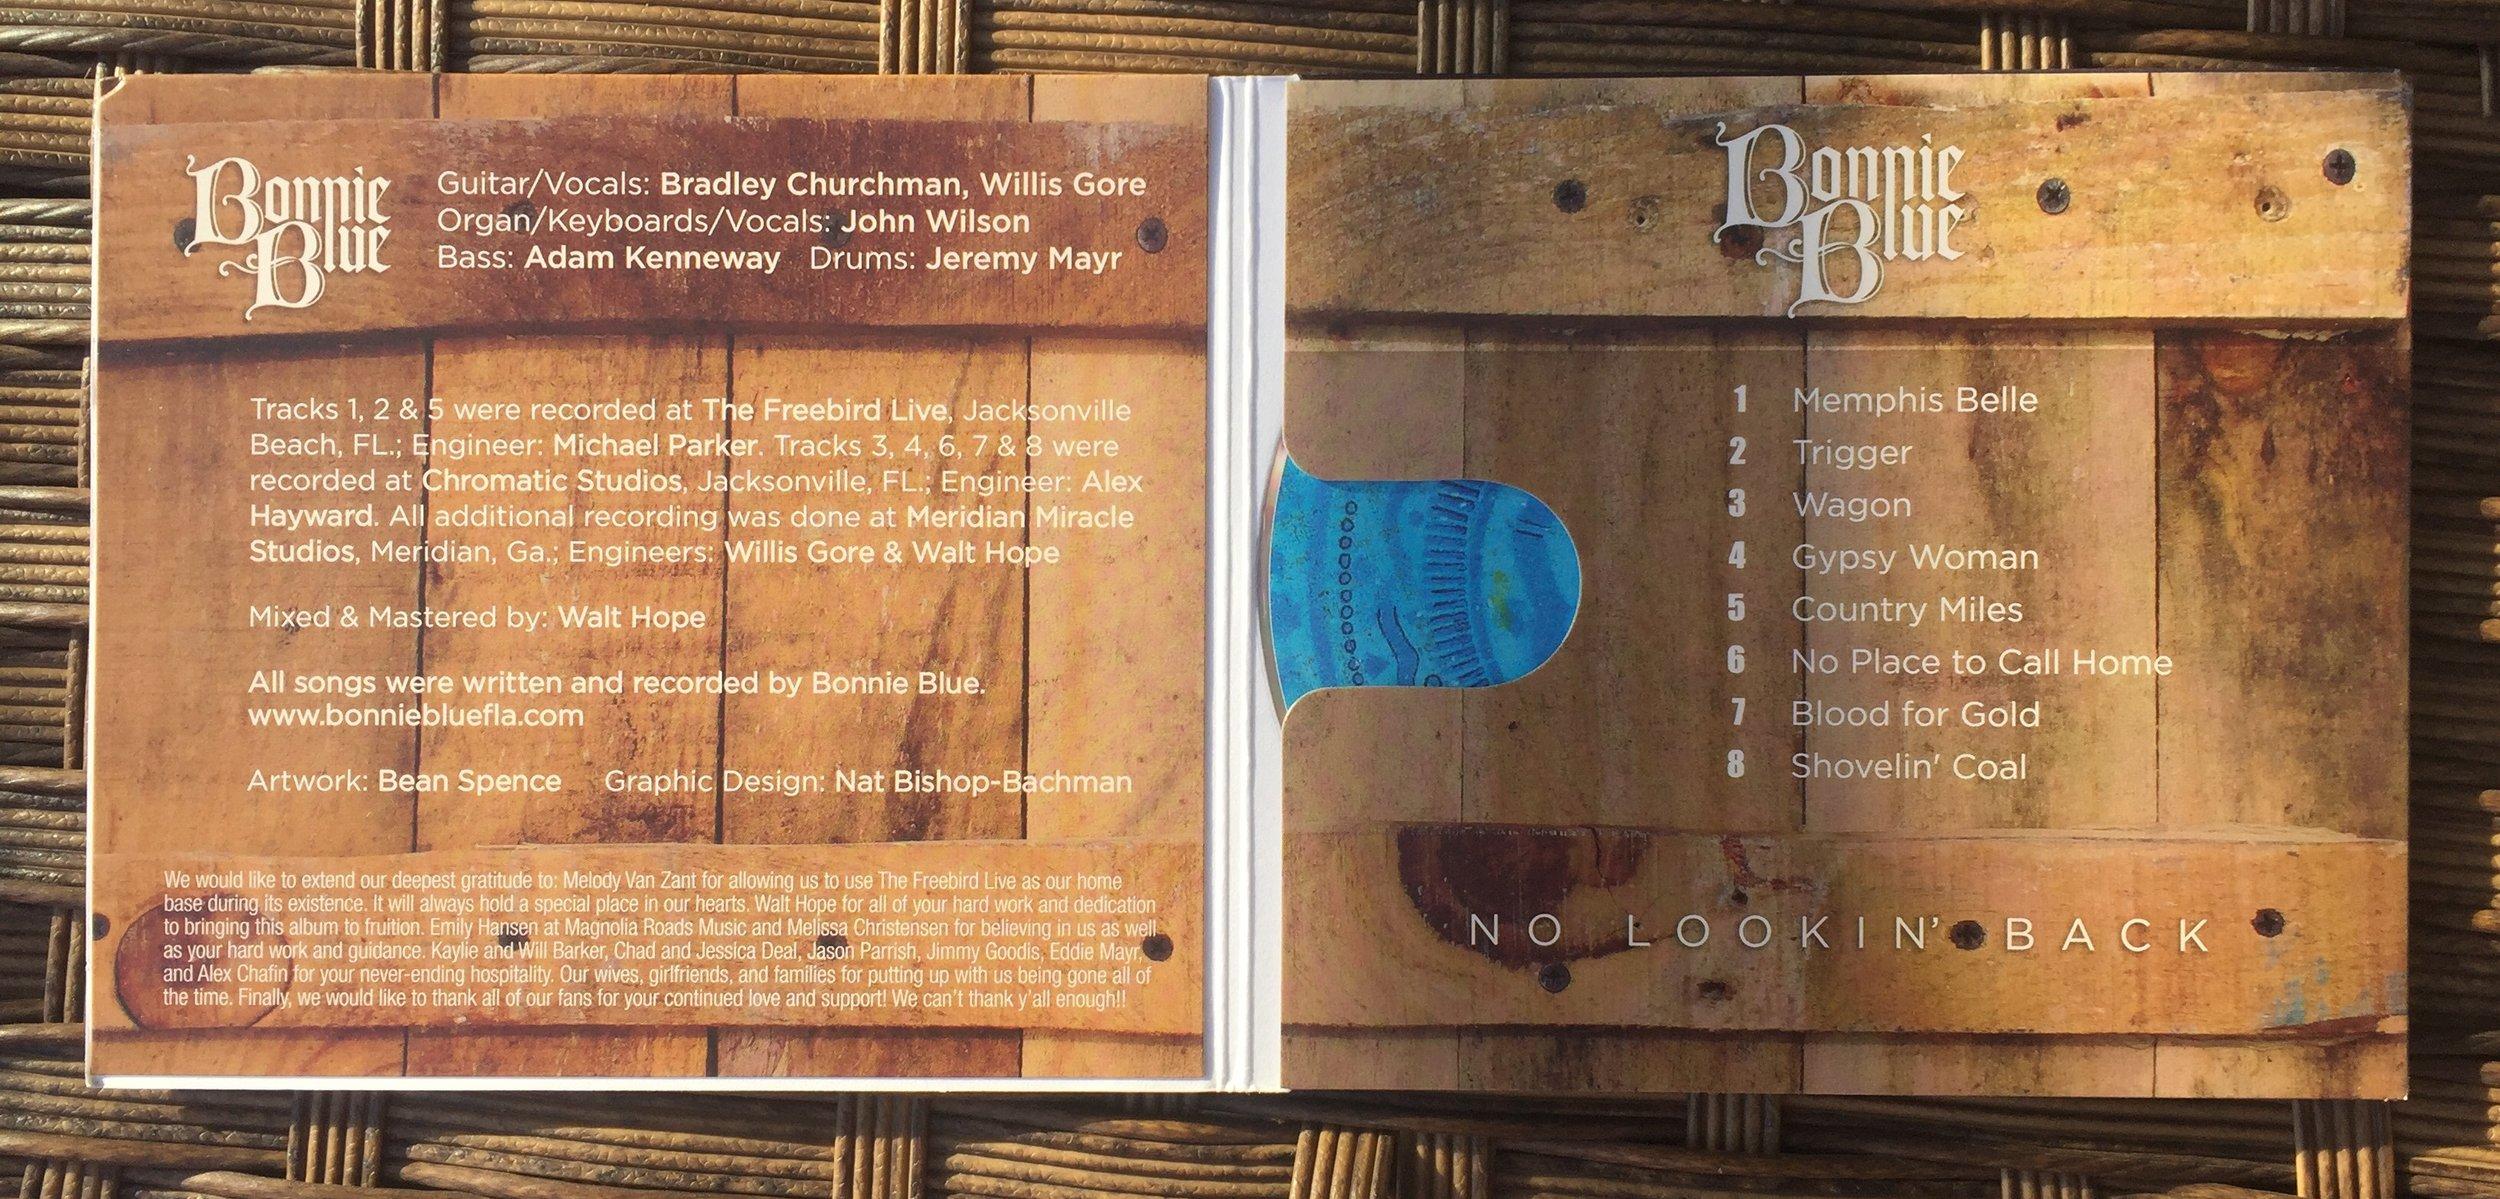 Bonnie Blue No Lokkin Back album tracks details  .jpg